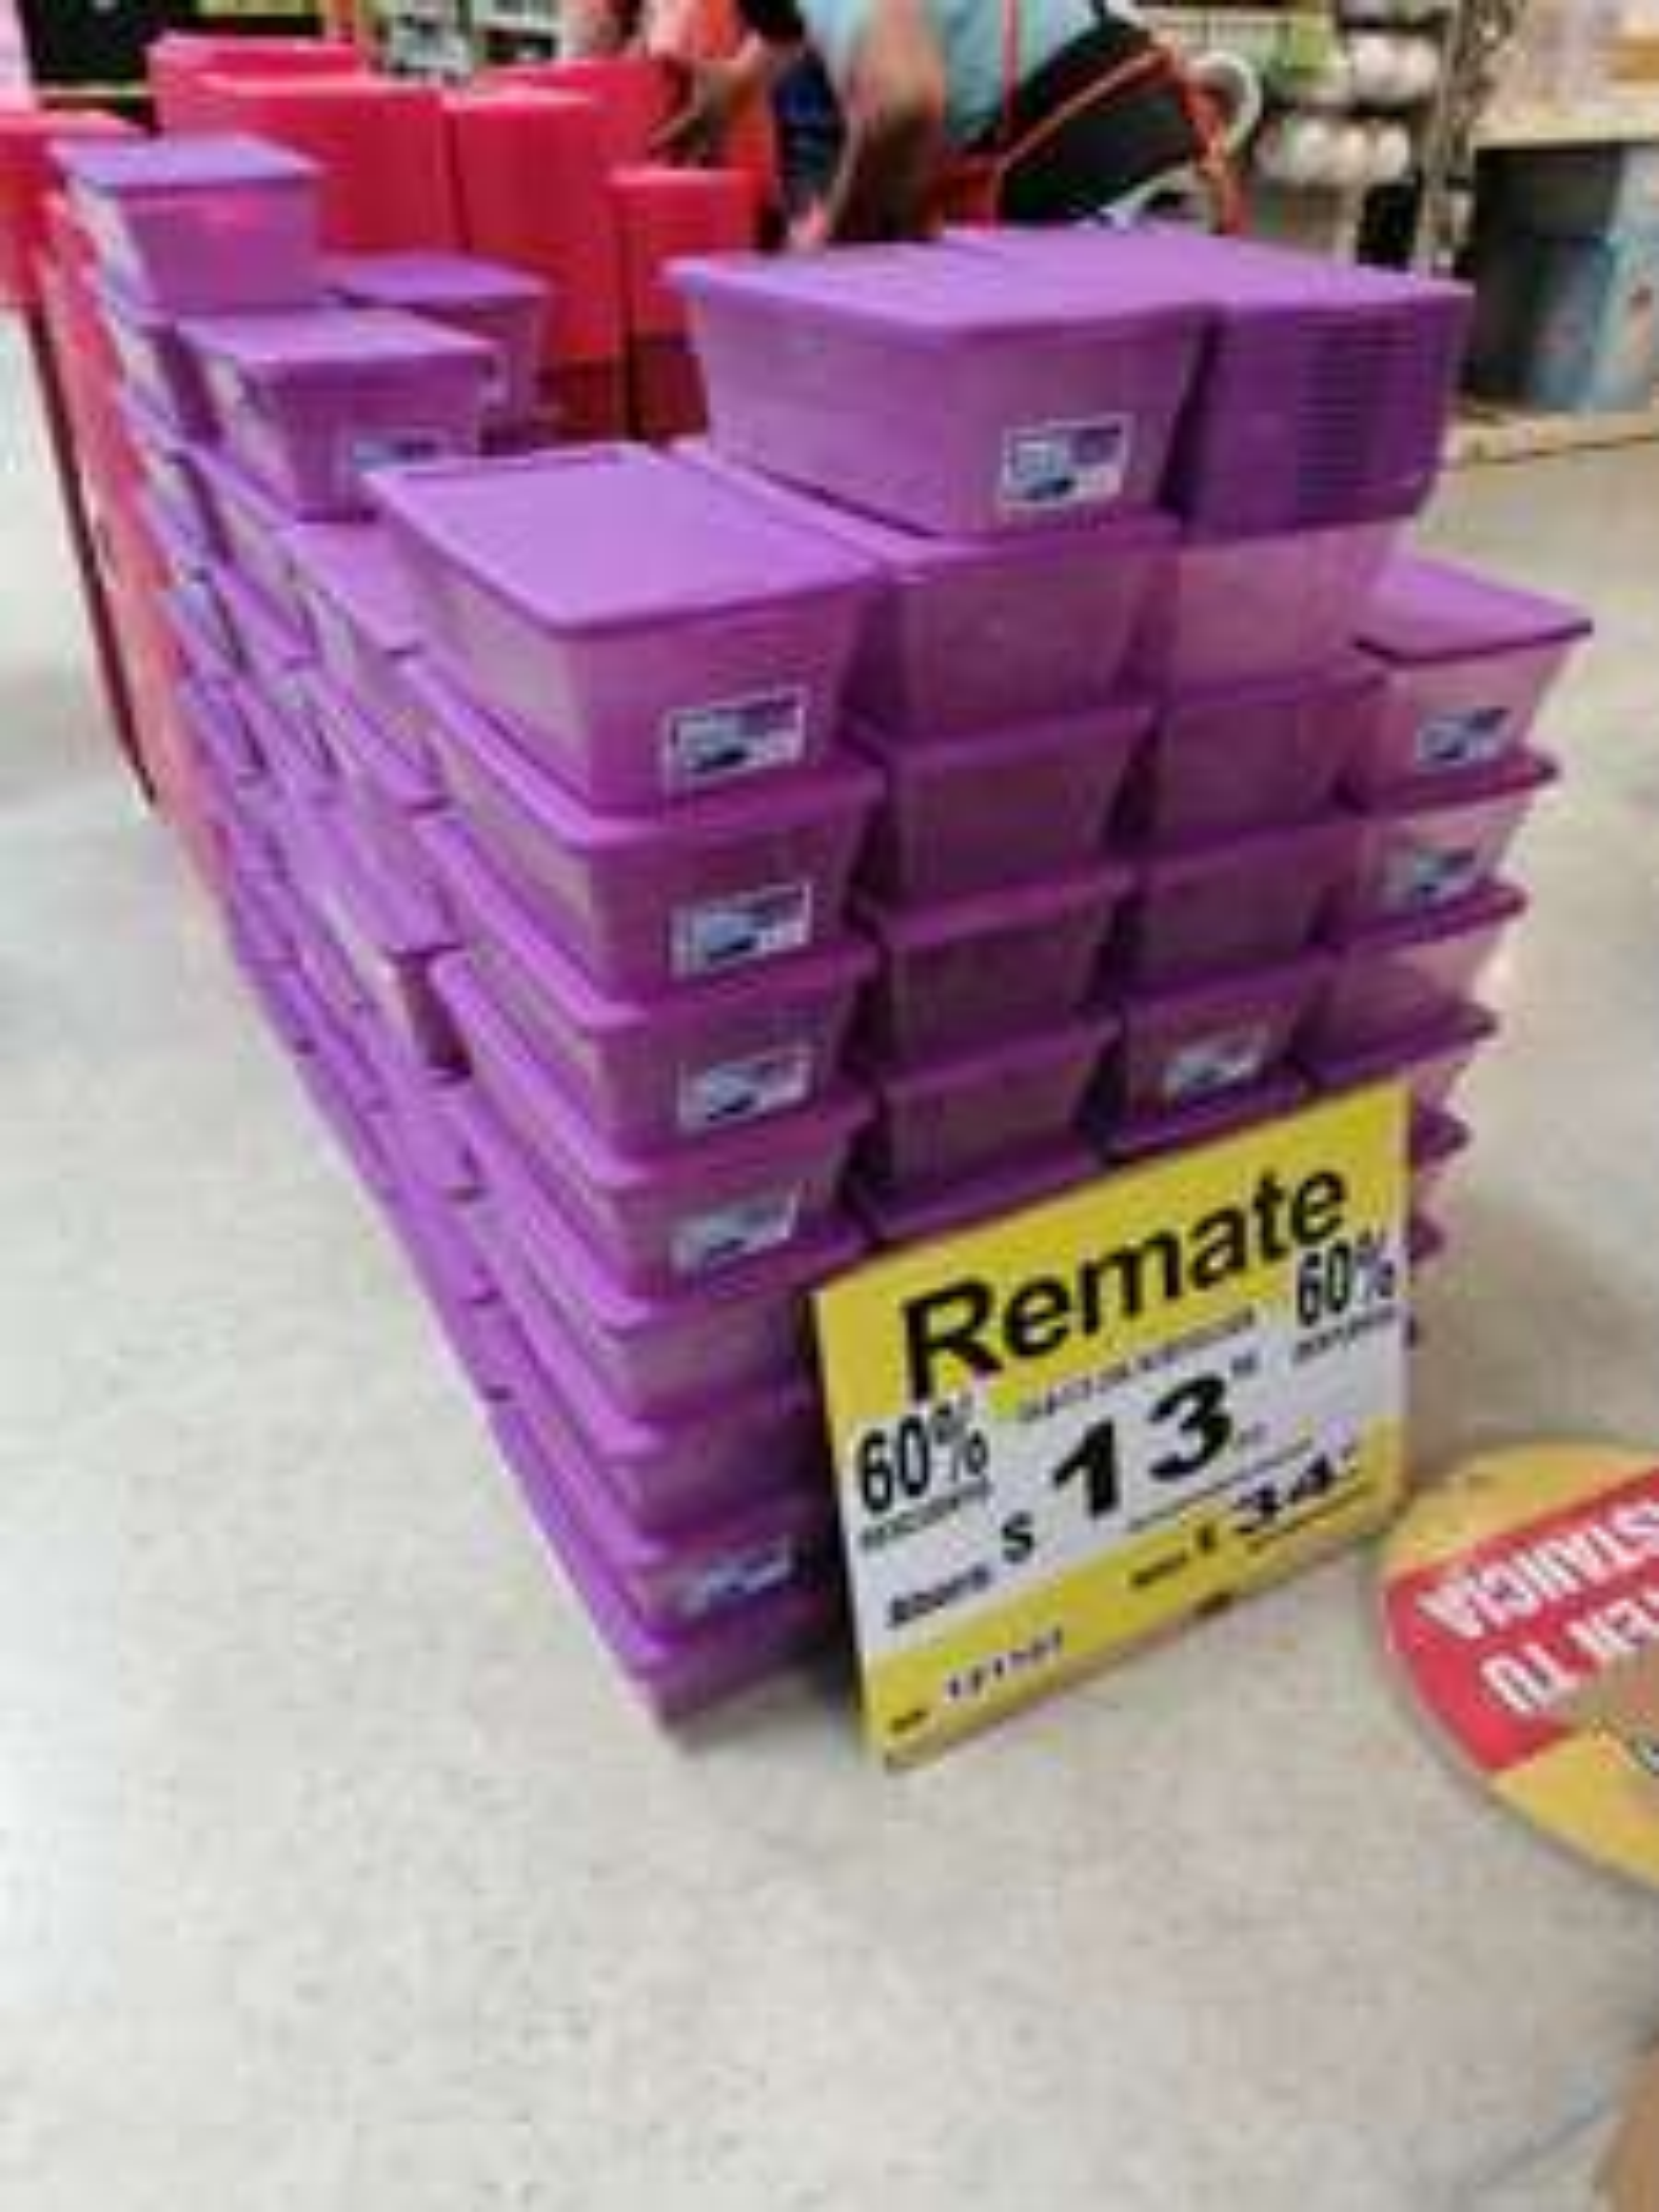 Home Depot: Caja Sterilite 5.7 litros en remate